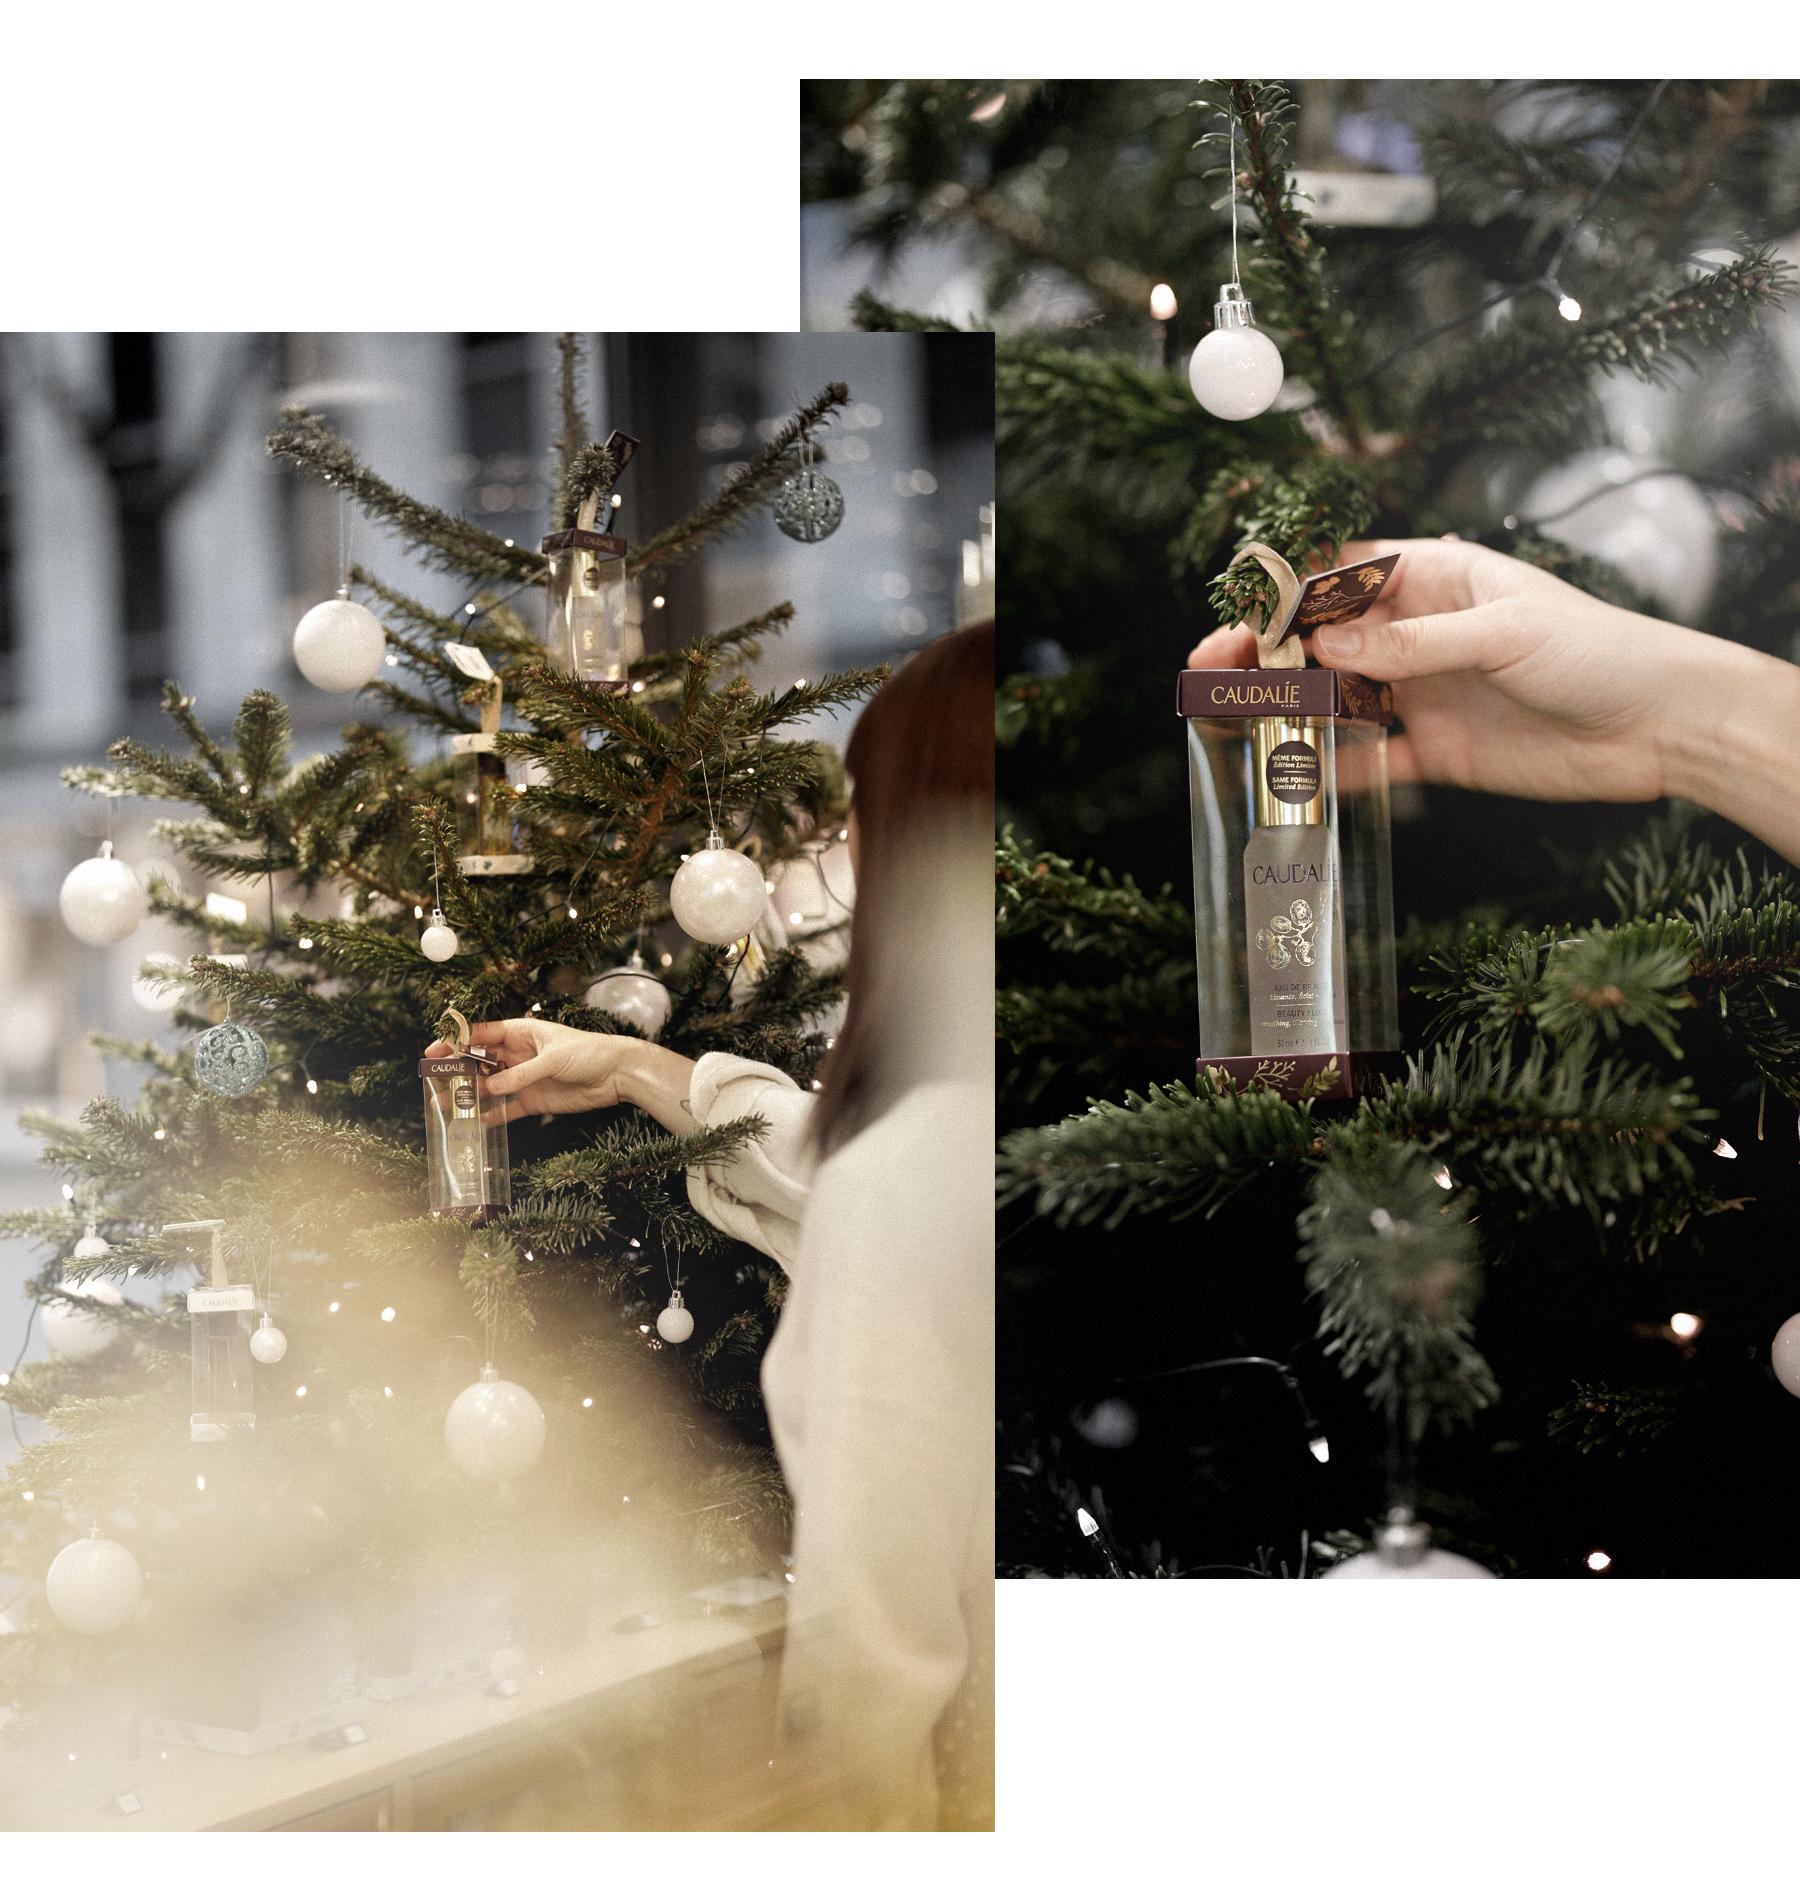 caudalie christmas boutique spa düsseldorf bordeaux france beauty beauté ricarda schernus xmas holidays gewinnspiel win snow lights wiehundundkatze catsanddogsblog modeblog beautyblogger germany max bechmann fotografie film 6